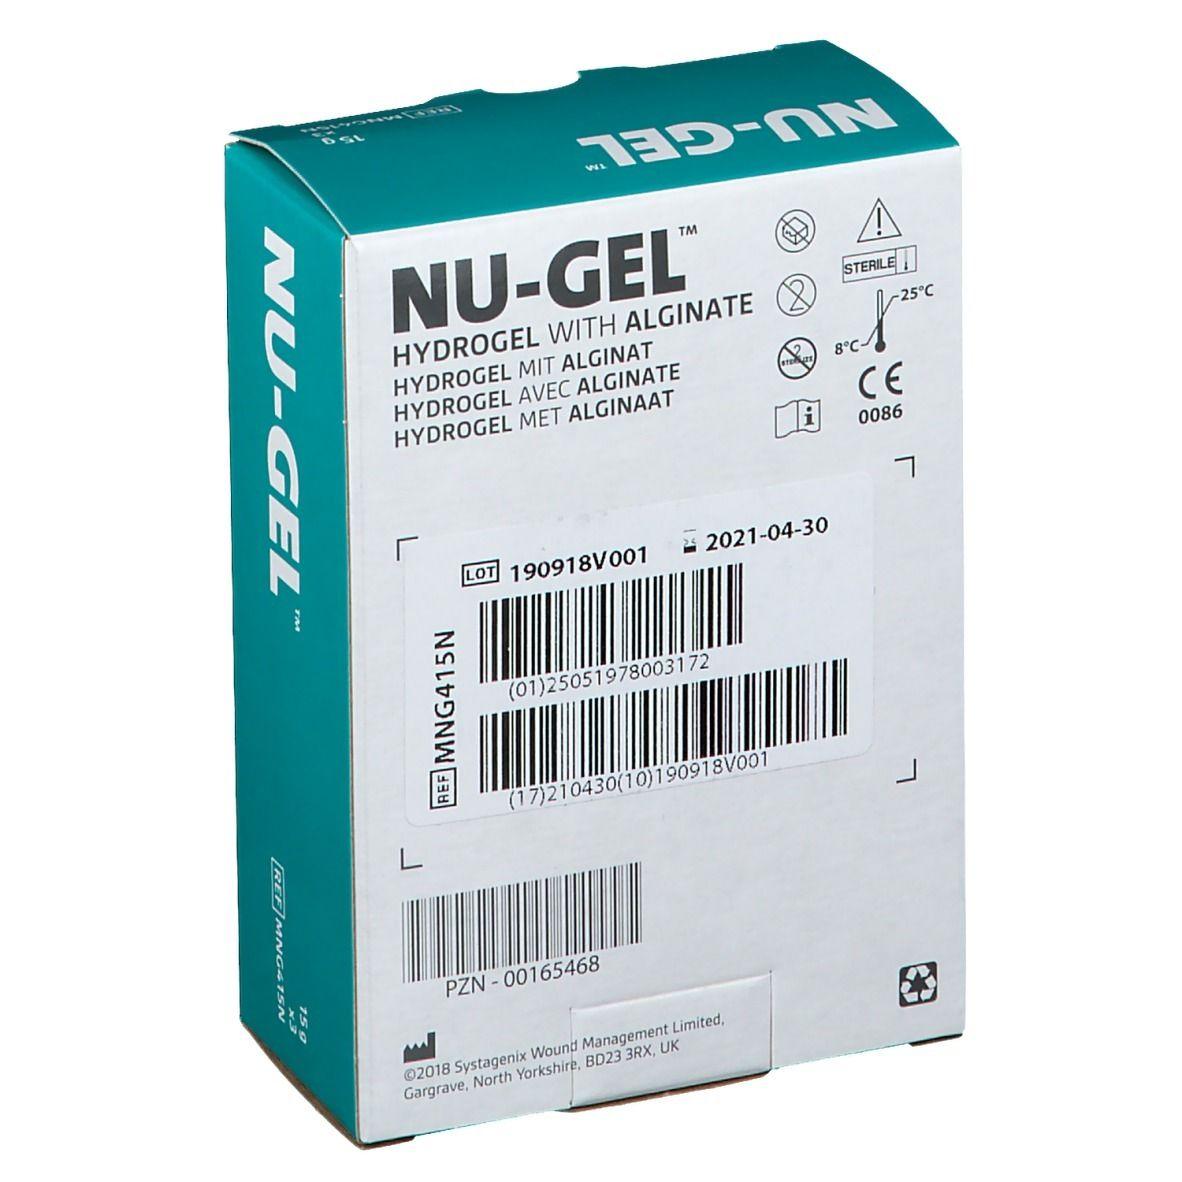 NU-GEL Hydrogel mit Alginat